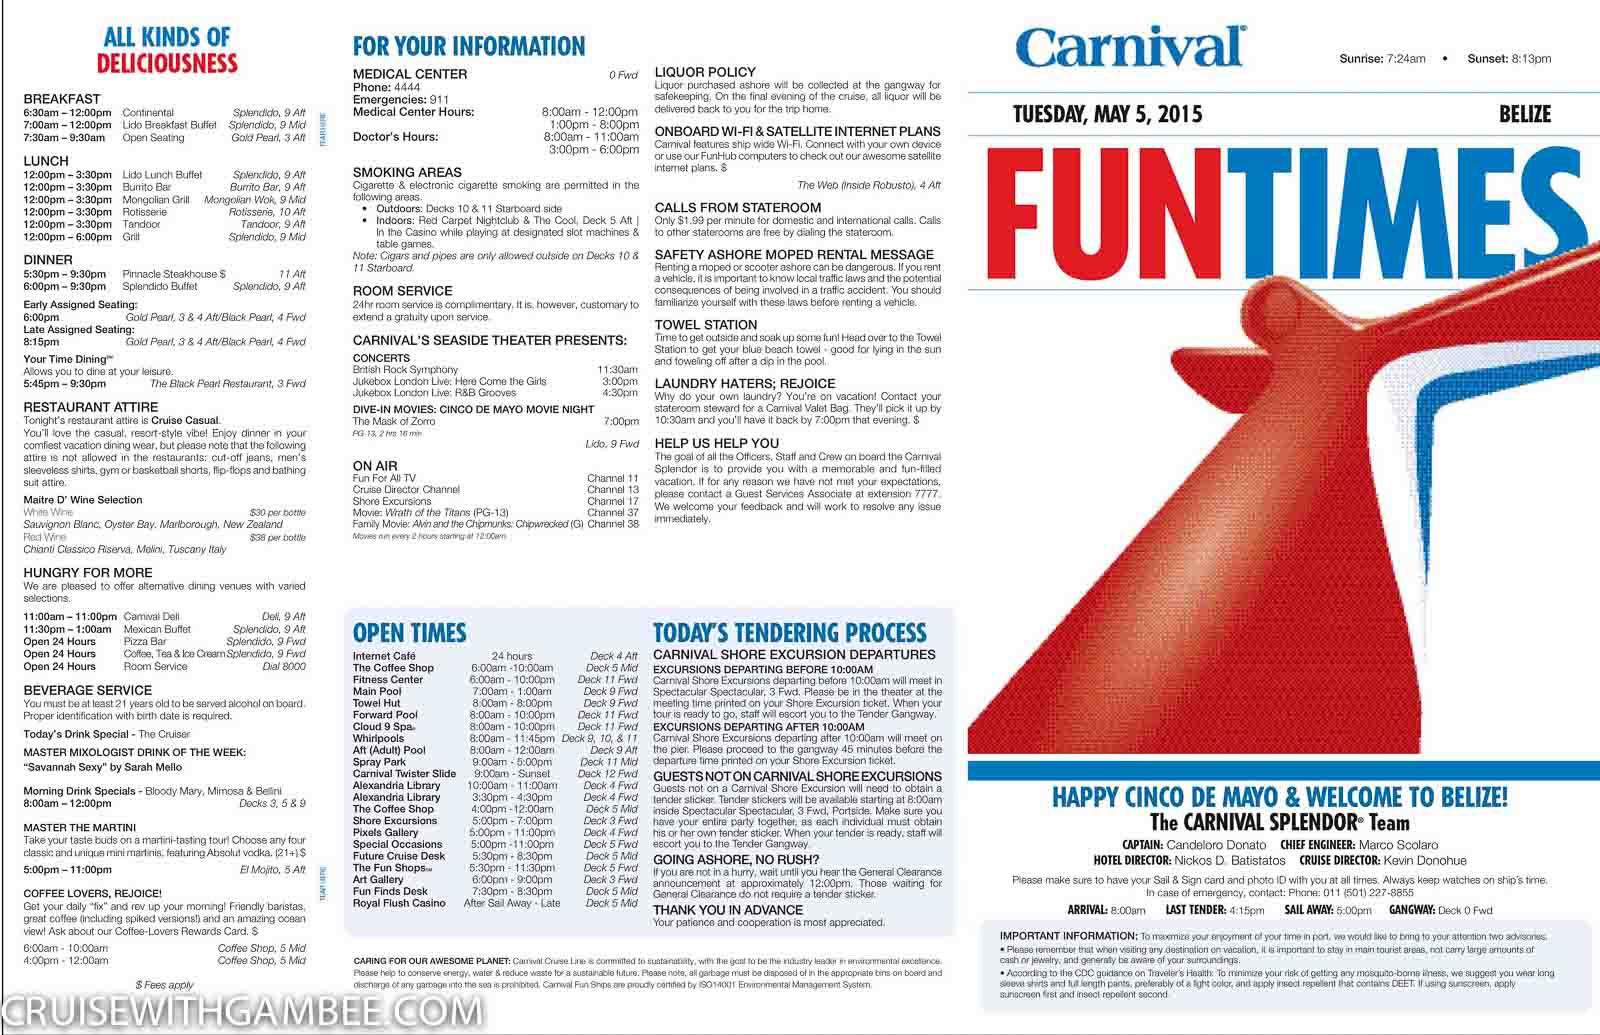 Carnival Splendor Funtimes-2